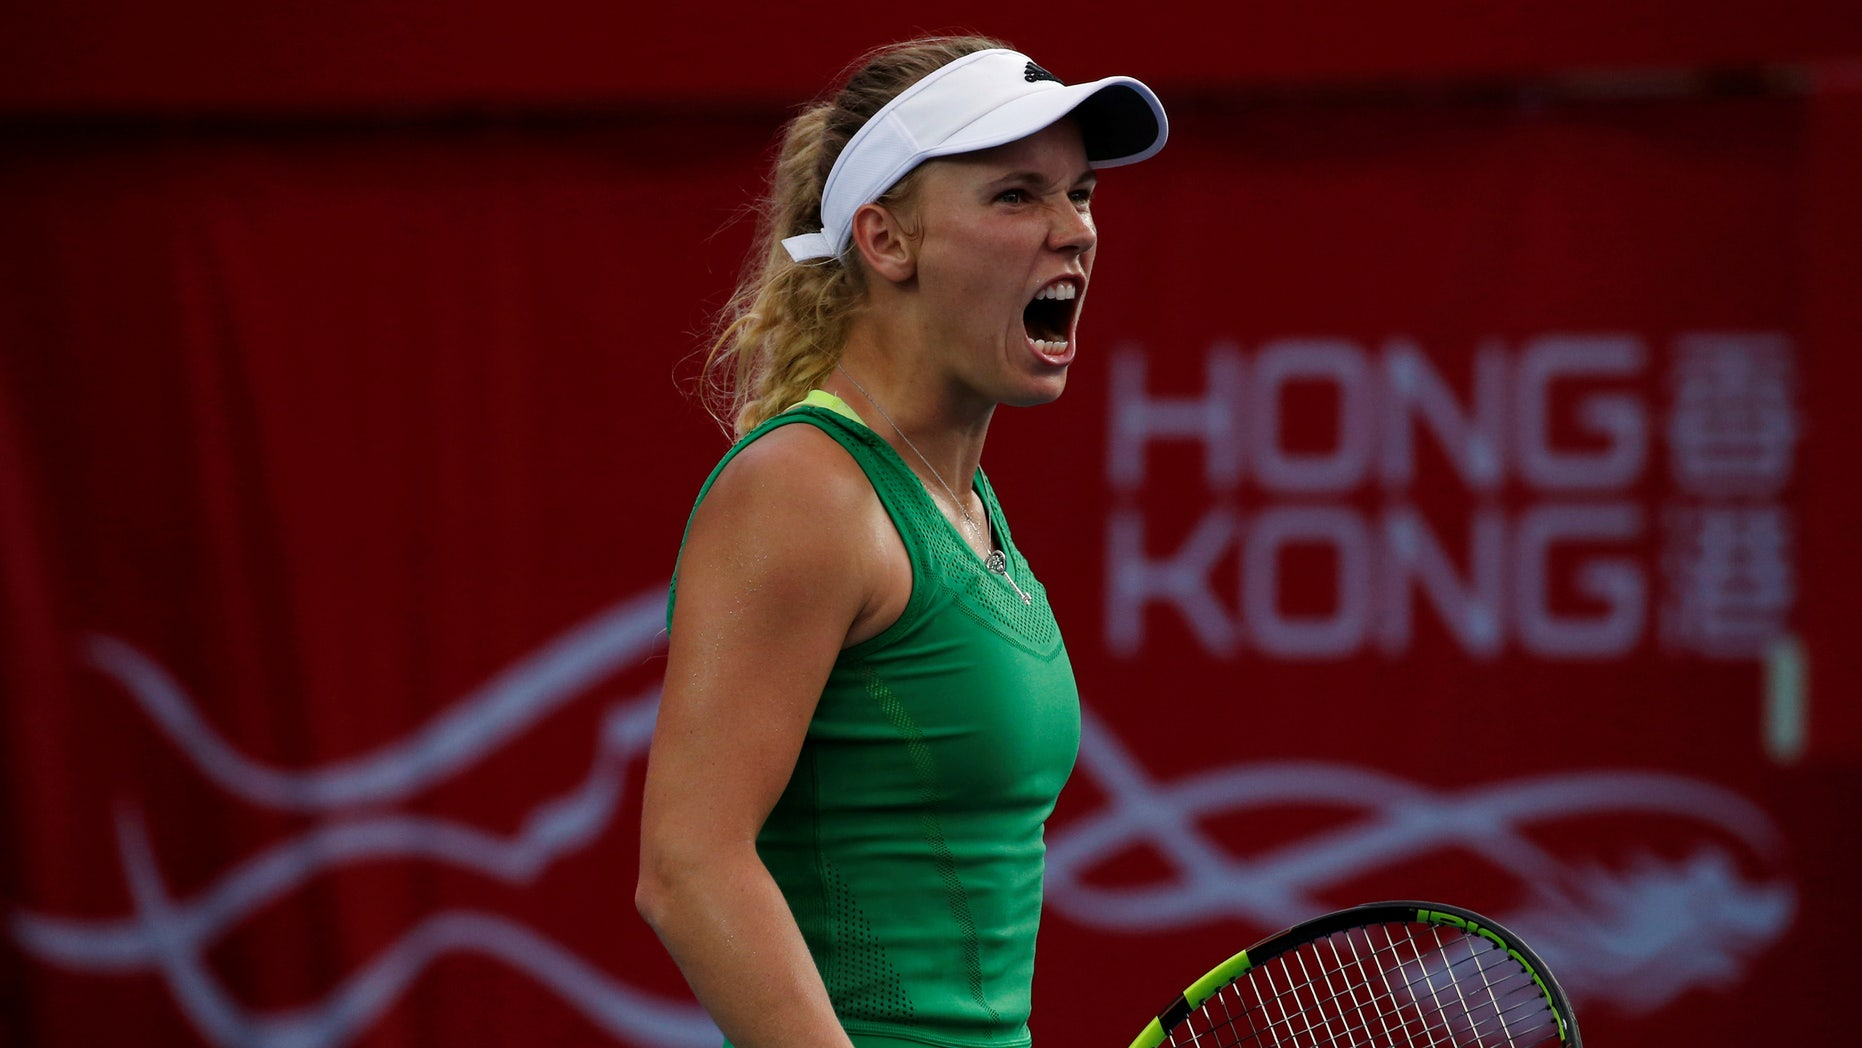 Tennis - Hong Kong Open final - Caroline Wozniacki of Denmark v Kristina Mladenovic of France - Hong Kong, China - 16/10/16. Wozniacki reacts after winning a point.  REUTERS/Bobby Yip - RTX2P0ZW